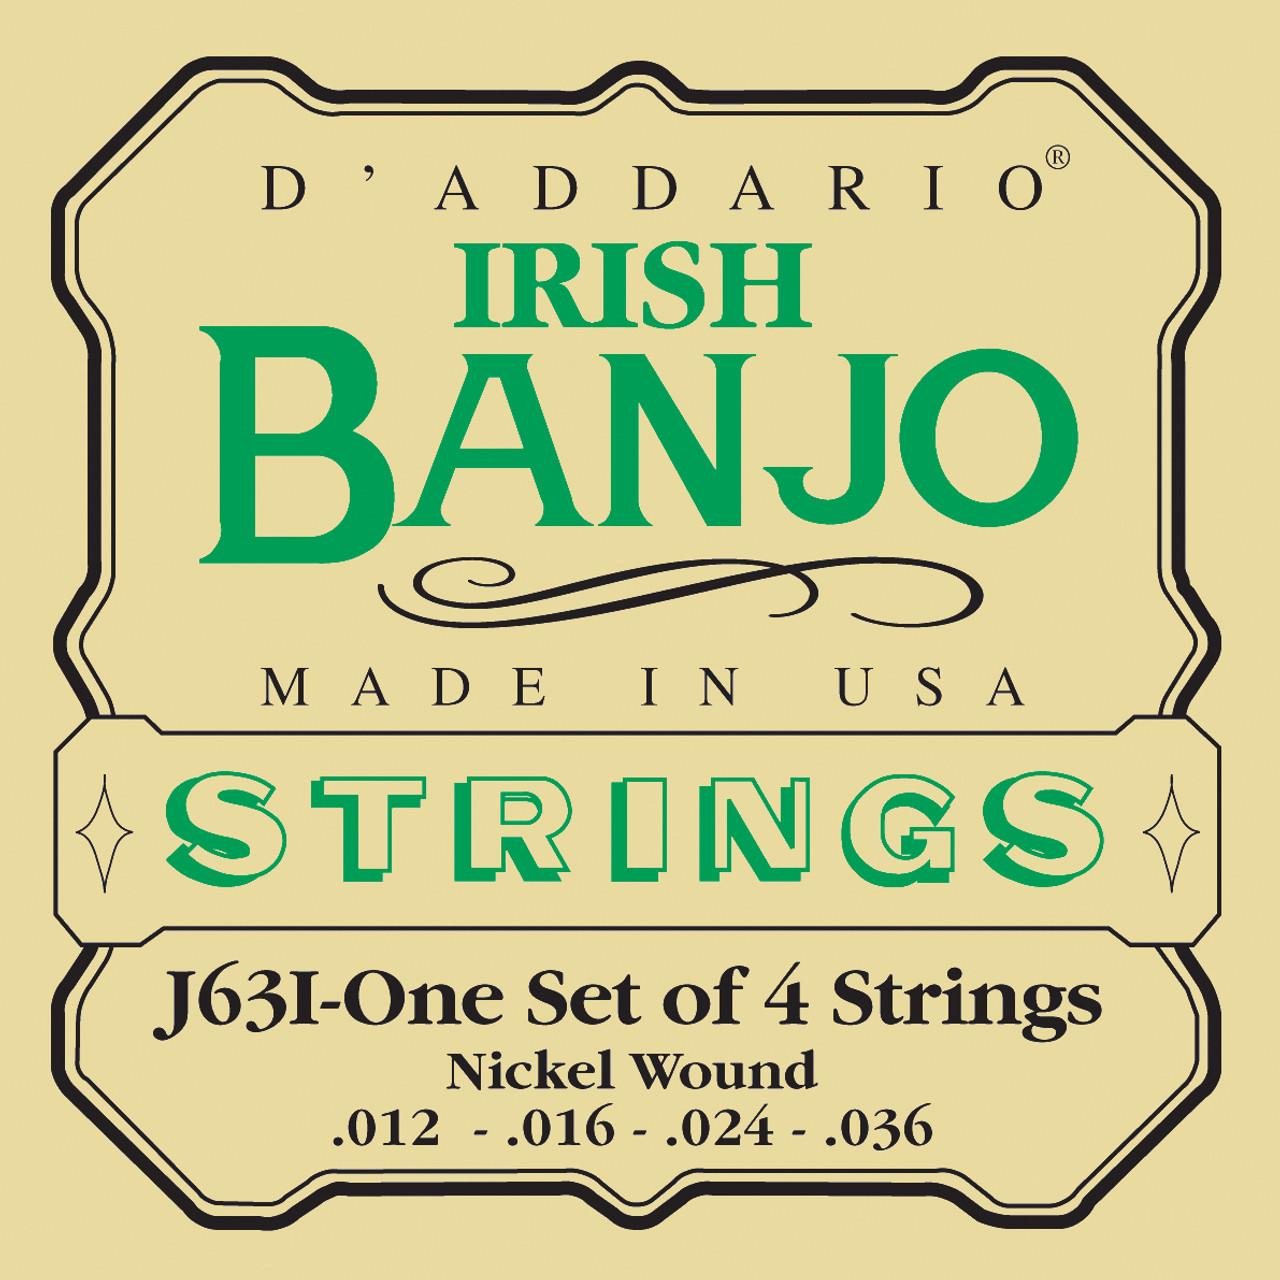 D'addario J63I Nickel Wound Banjo Strings